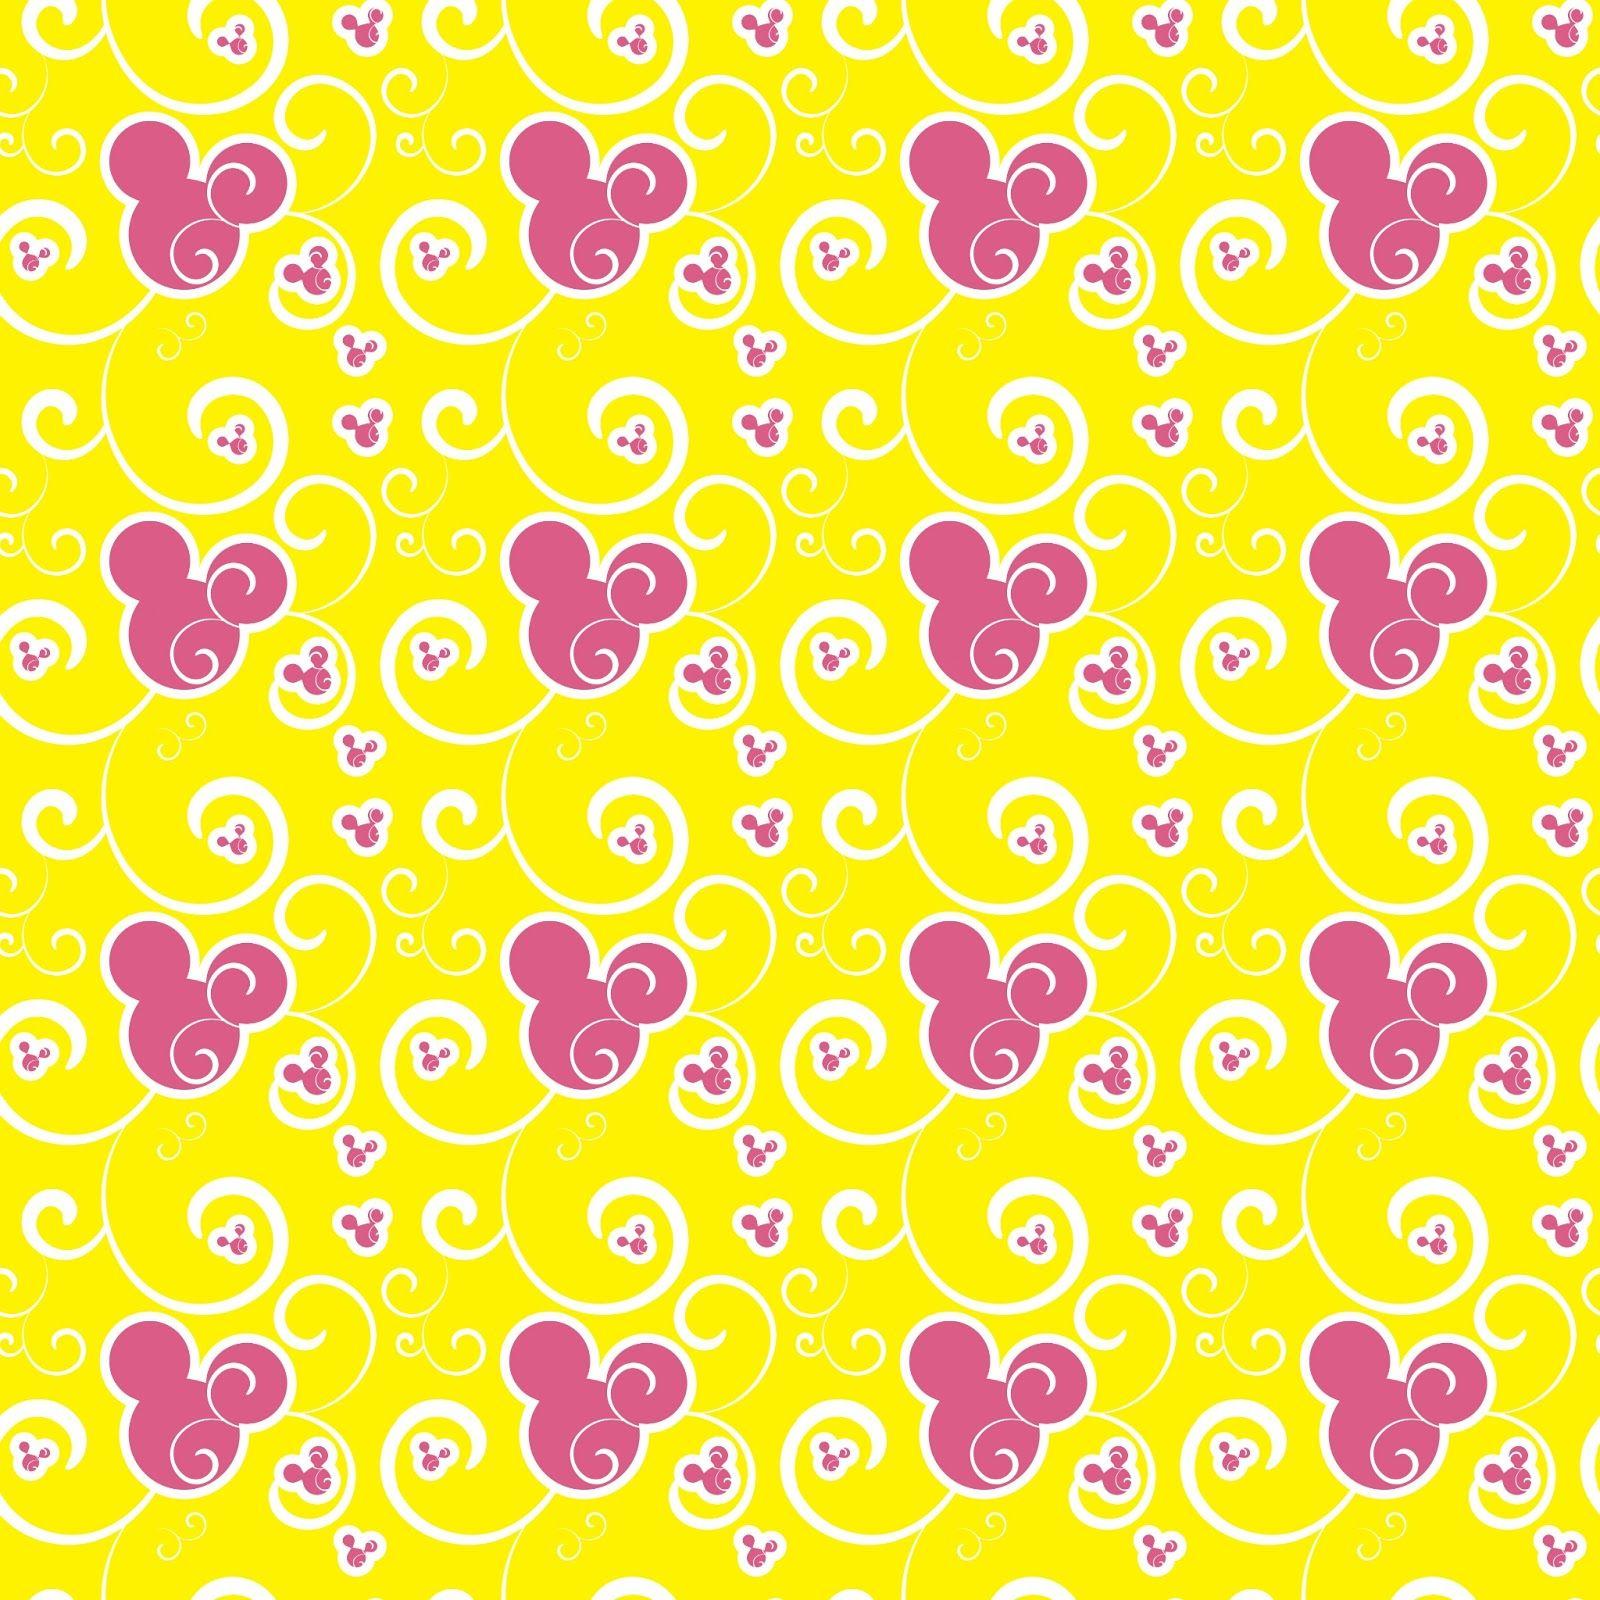 Scrapbook paper disney - Scrapdiggity Freebie Sweet Minnie Digital Papers Disney Scrapbookscrapbook